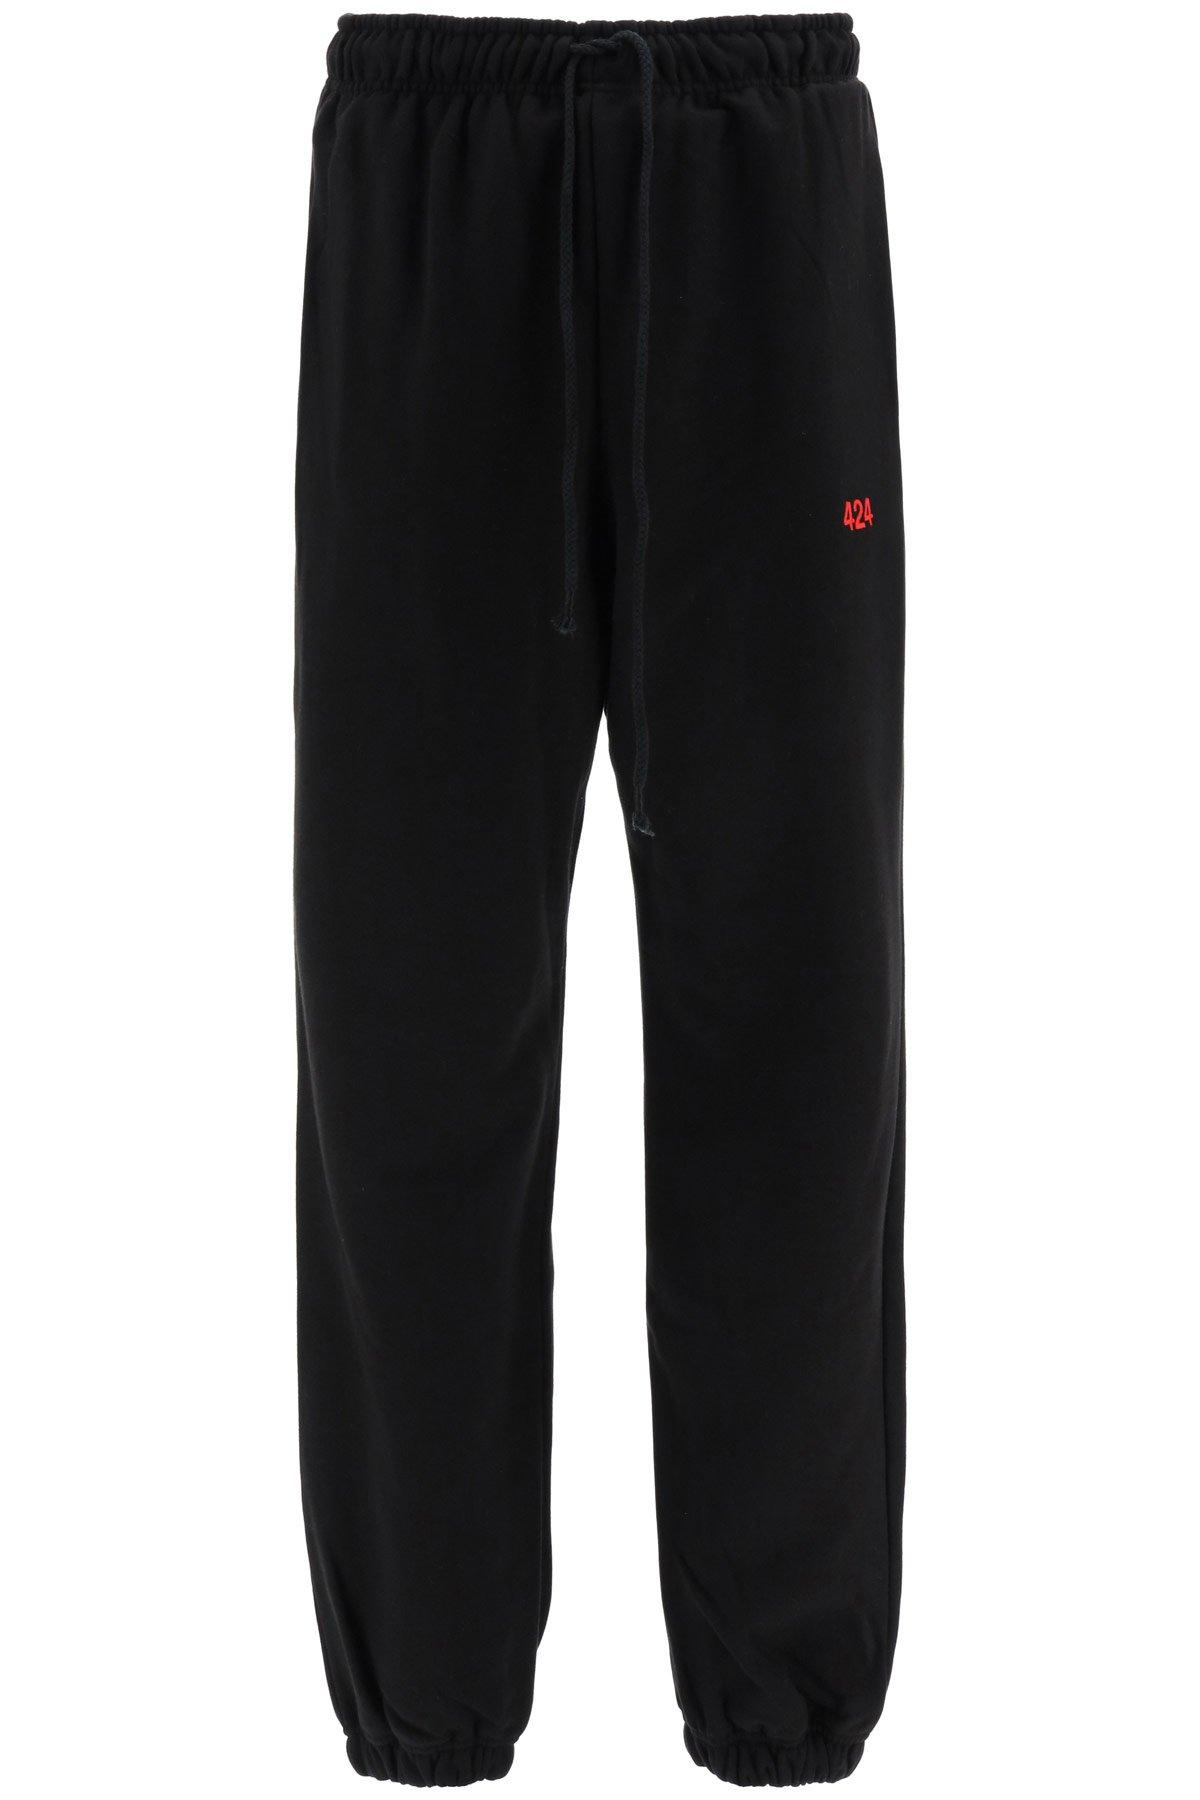 424 pantaloni jogger ricamo logo